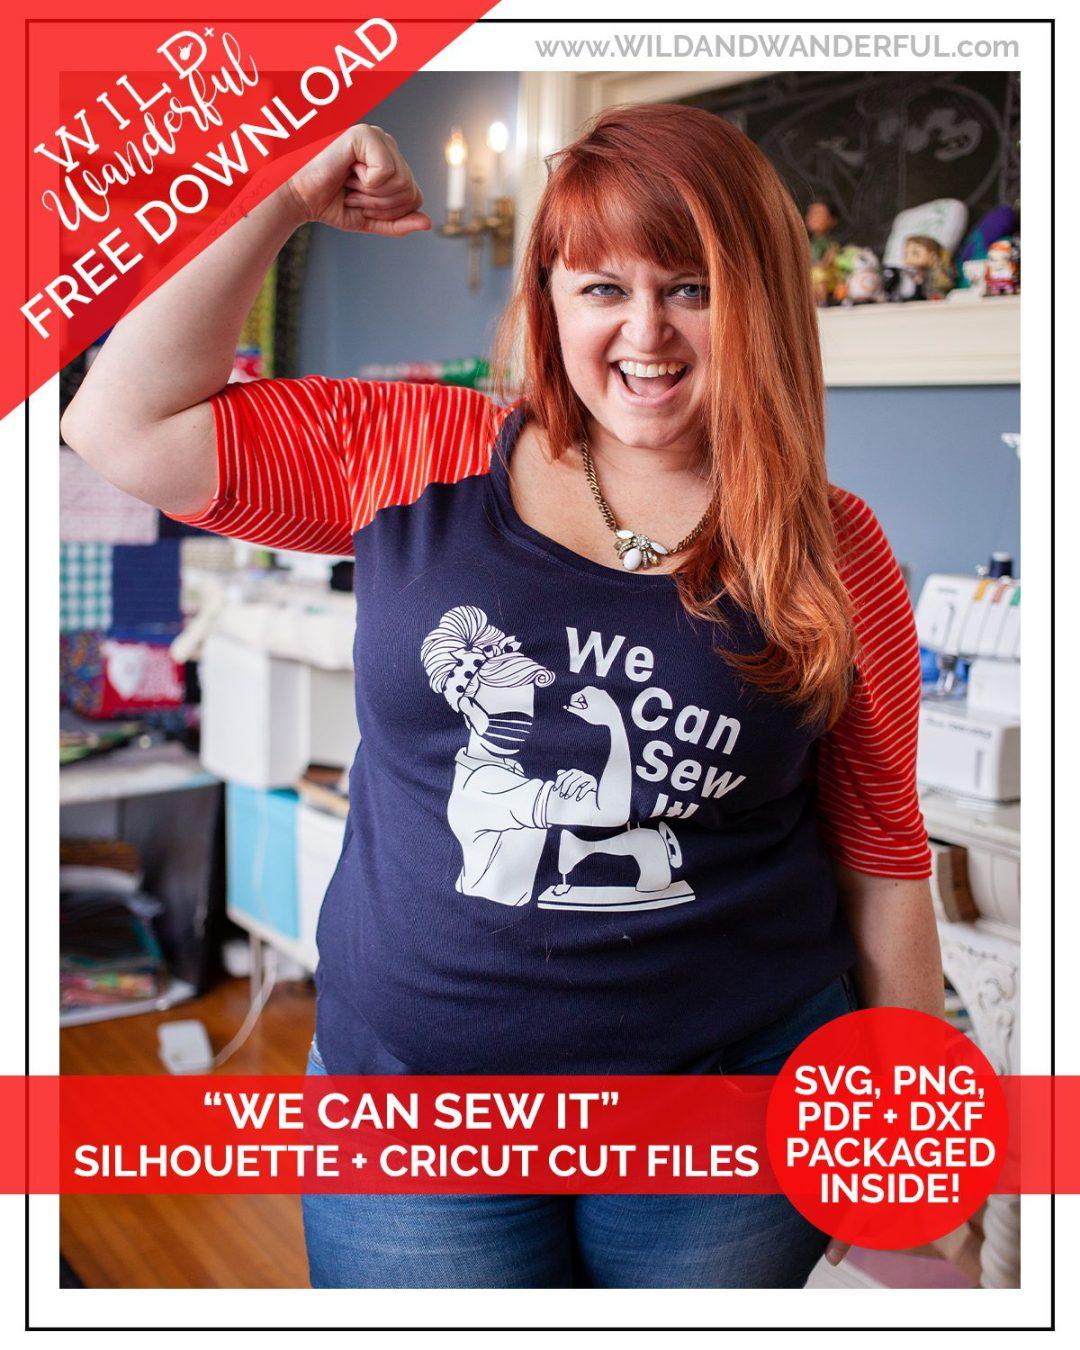 We Can Sew It! :: FREE Silhouette + Cricut Cut Files!